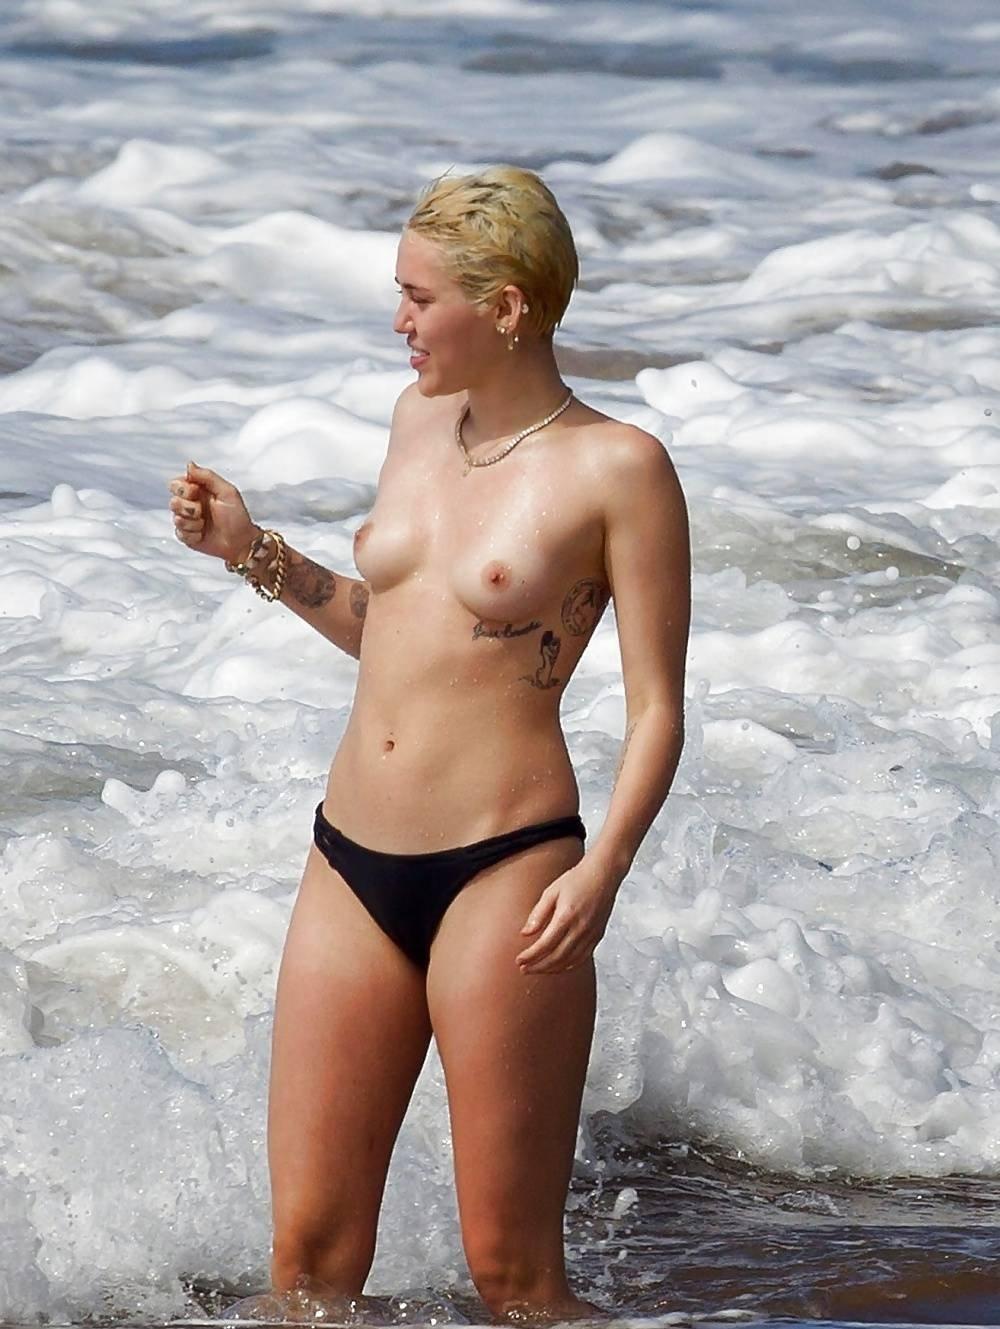 Miley cyrus boob slip